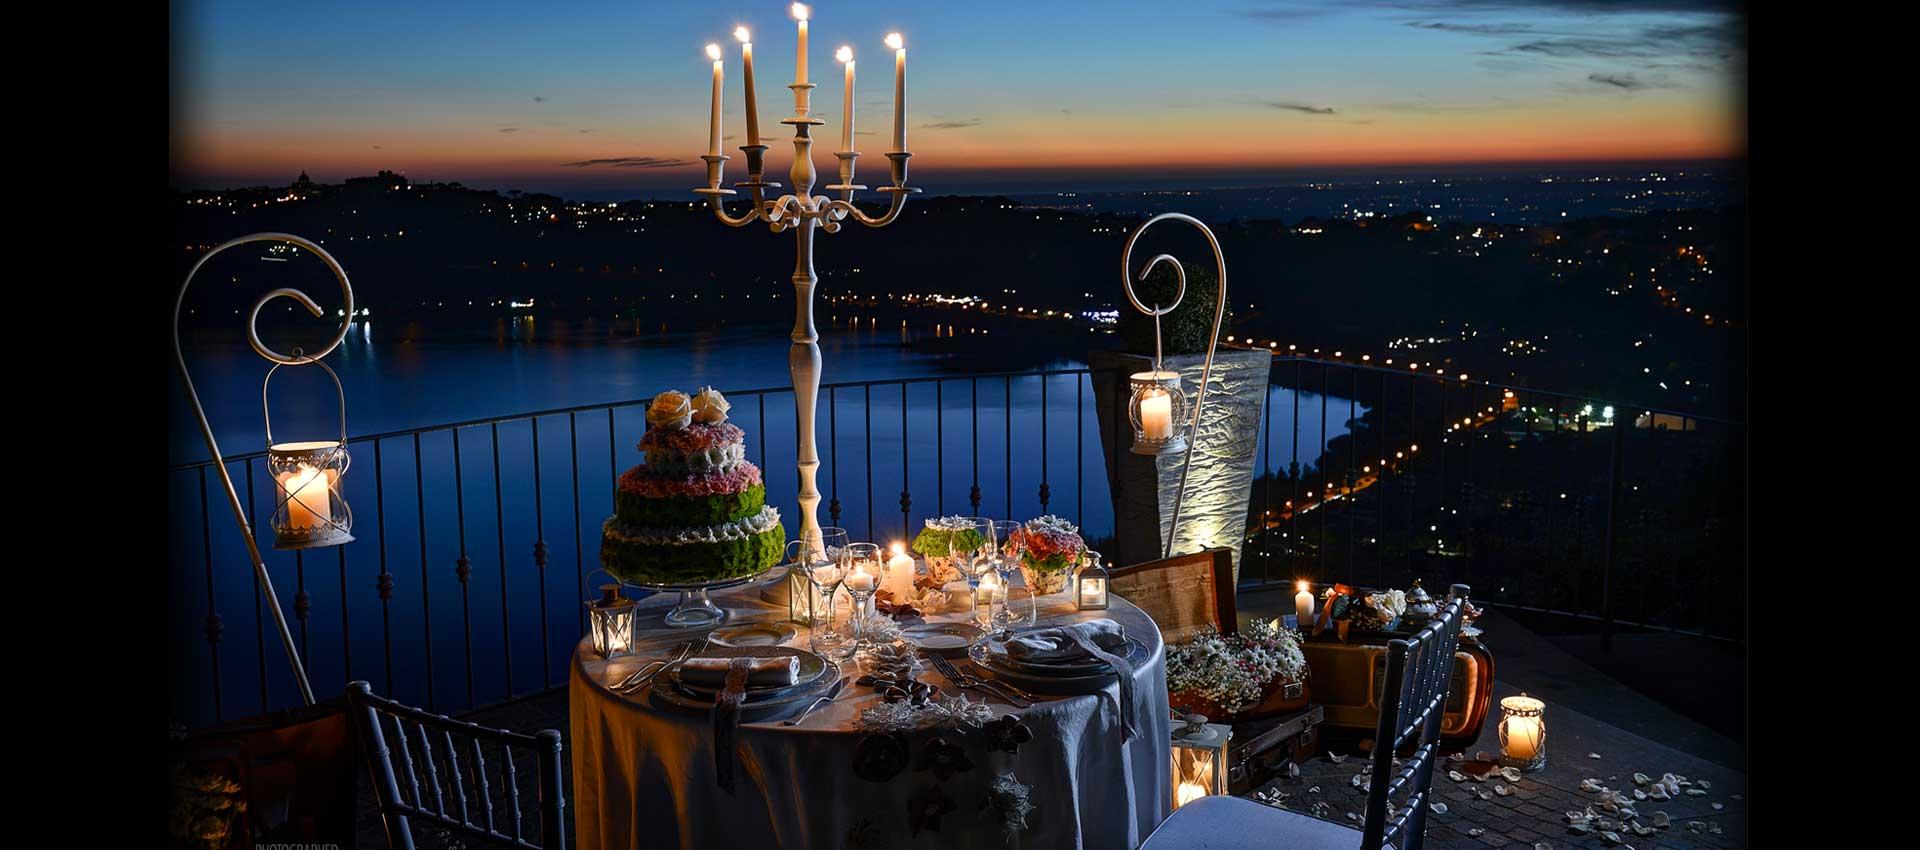 cena per due tavolo esterno con vista lago